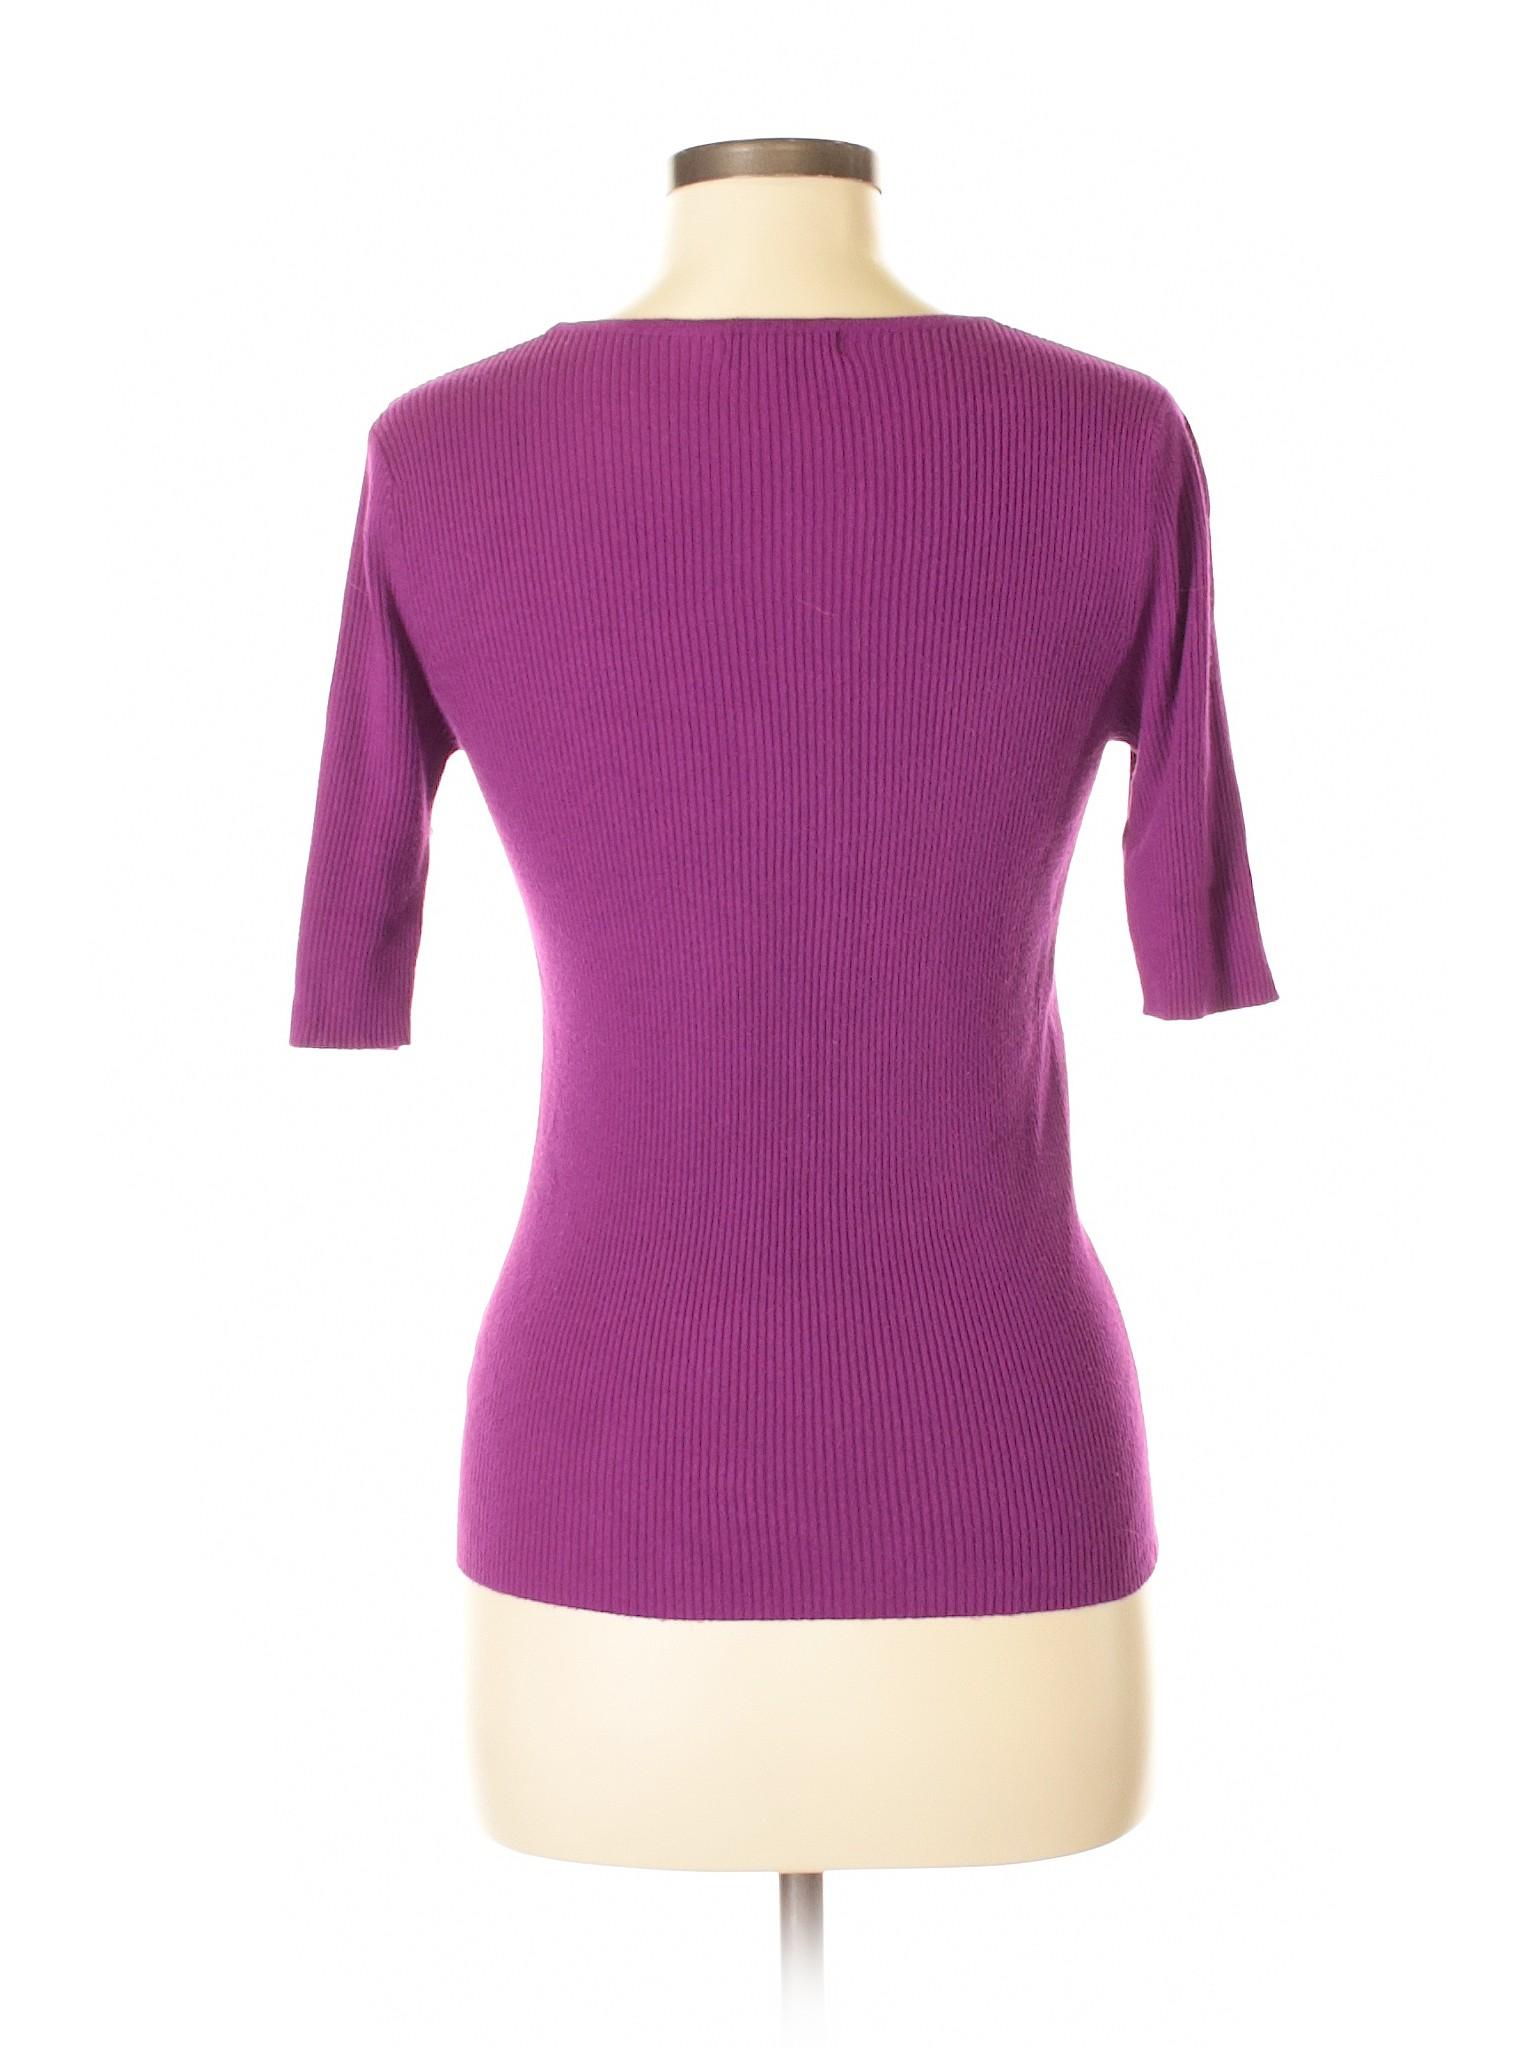 winter PREMISE PREMISE winter Sweater Pullover Boutique Pullover Sweater Boutique Boutique nqa004Yf